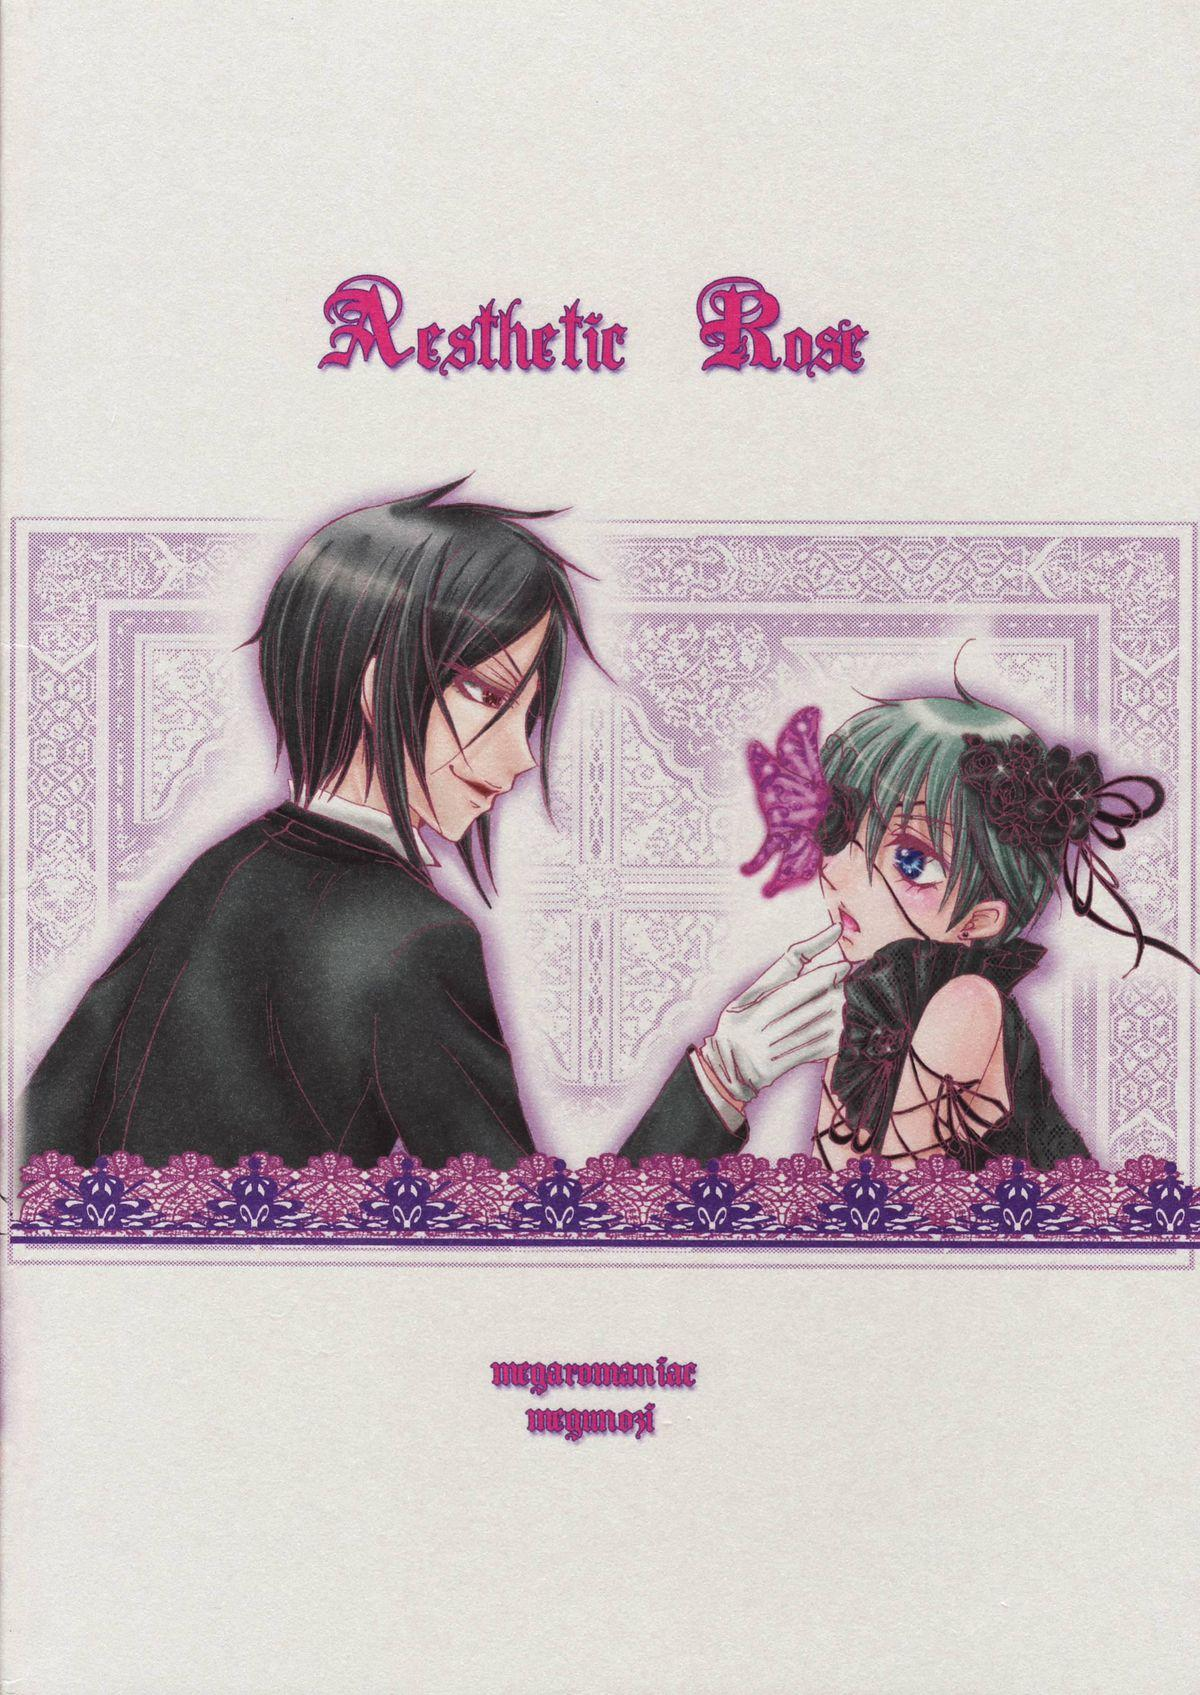 Kuroshitsuji  - Aesthetic Rose 24